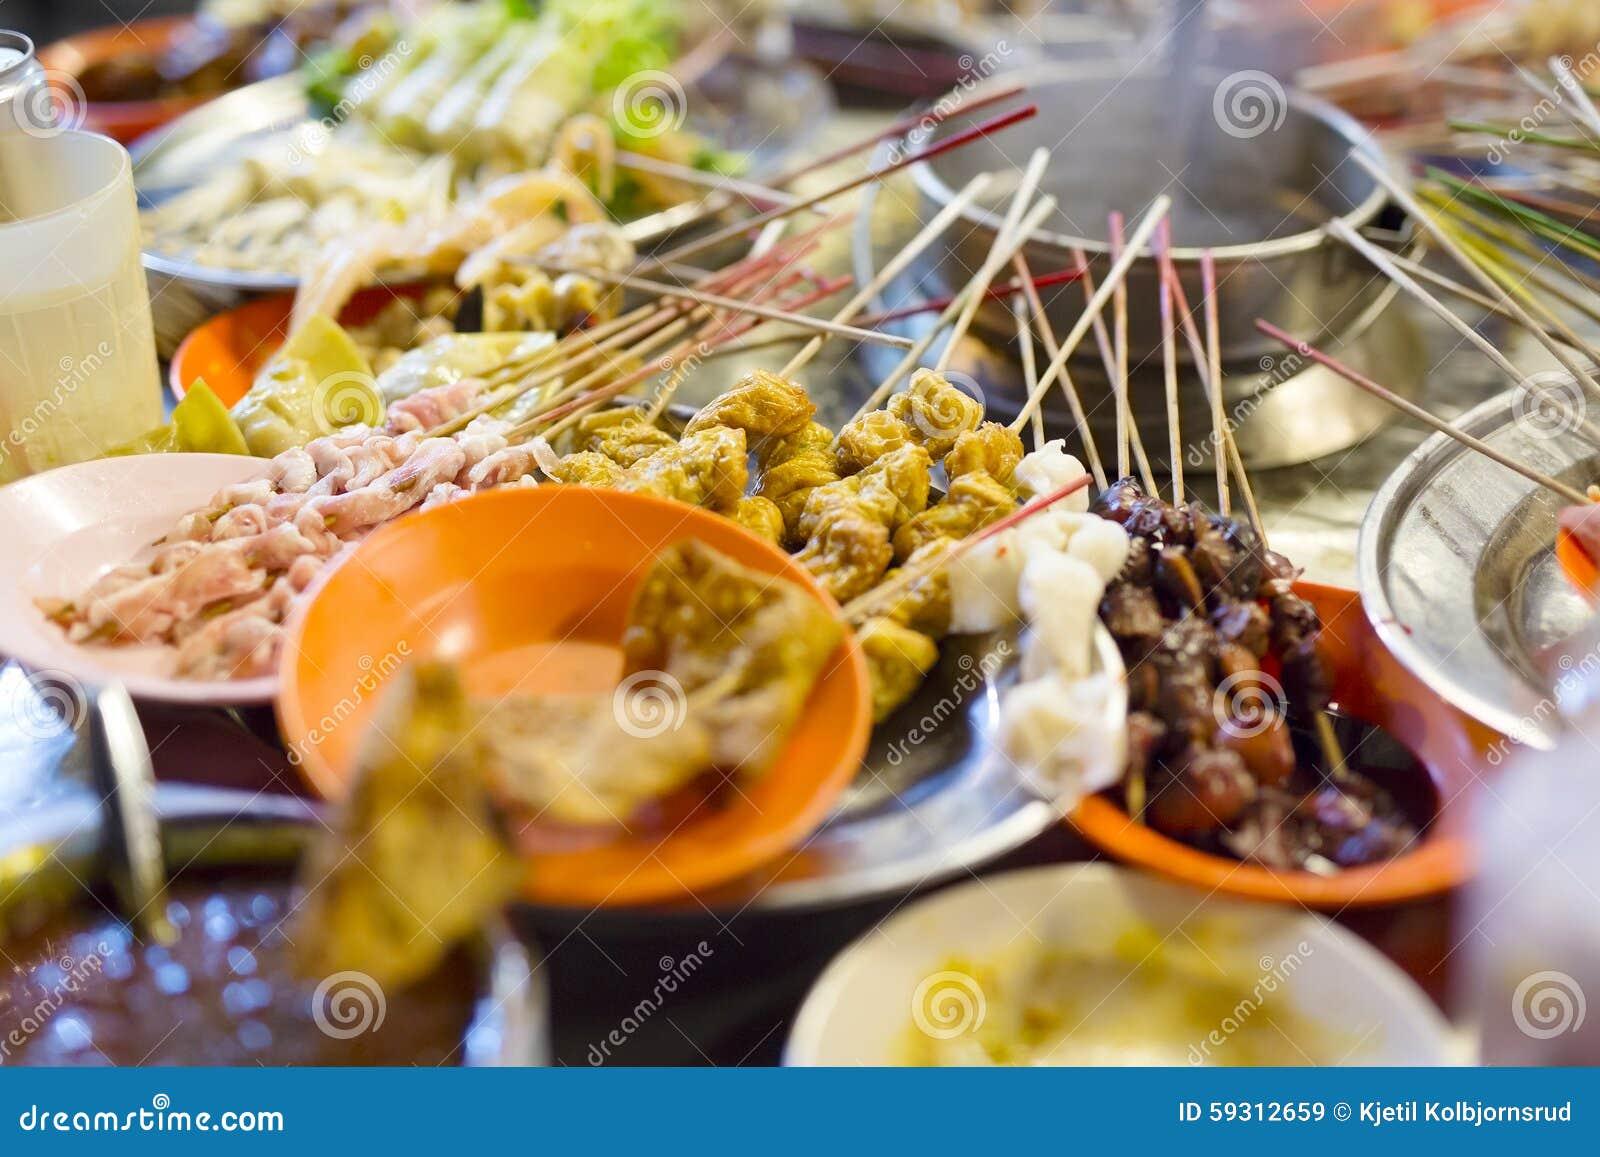 Traditional lok-lok street food from Malaysia